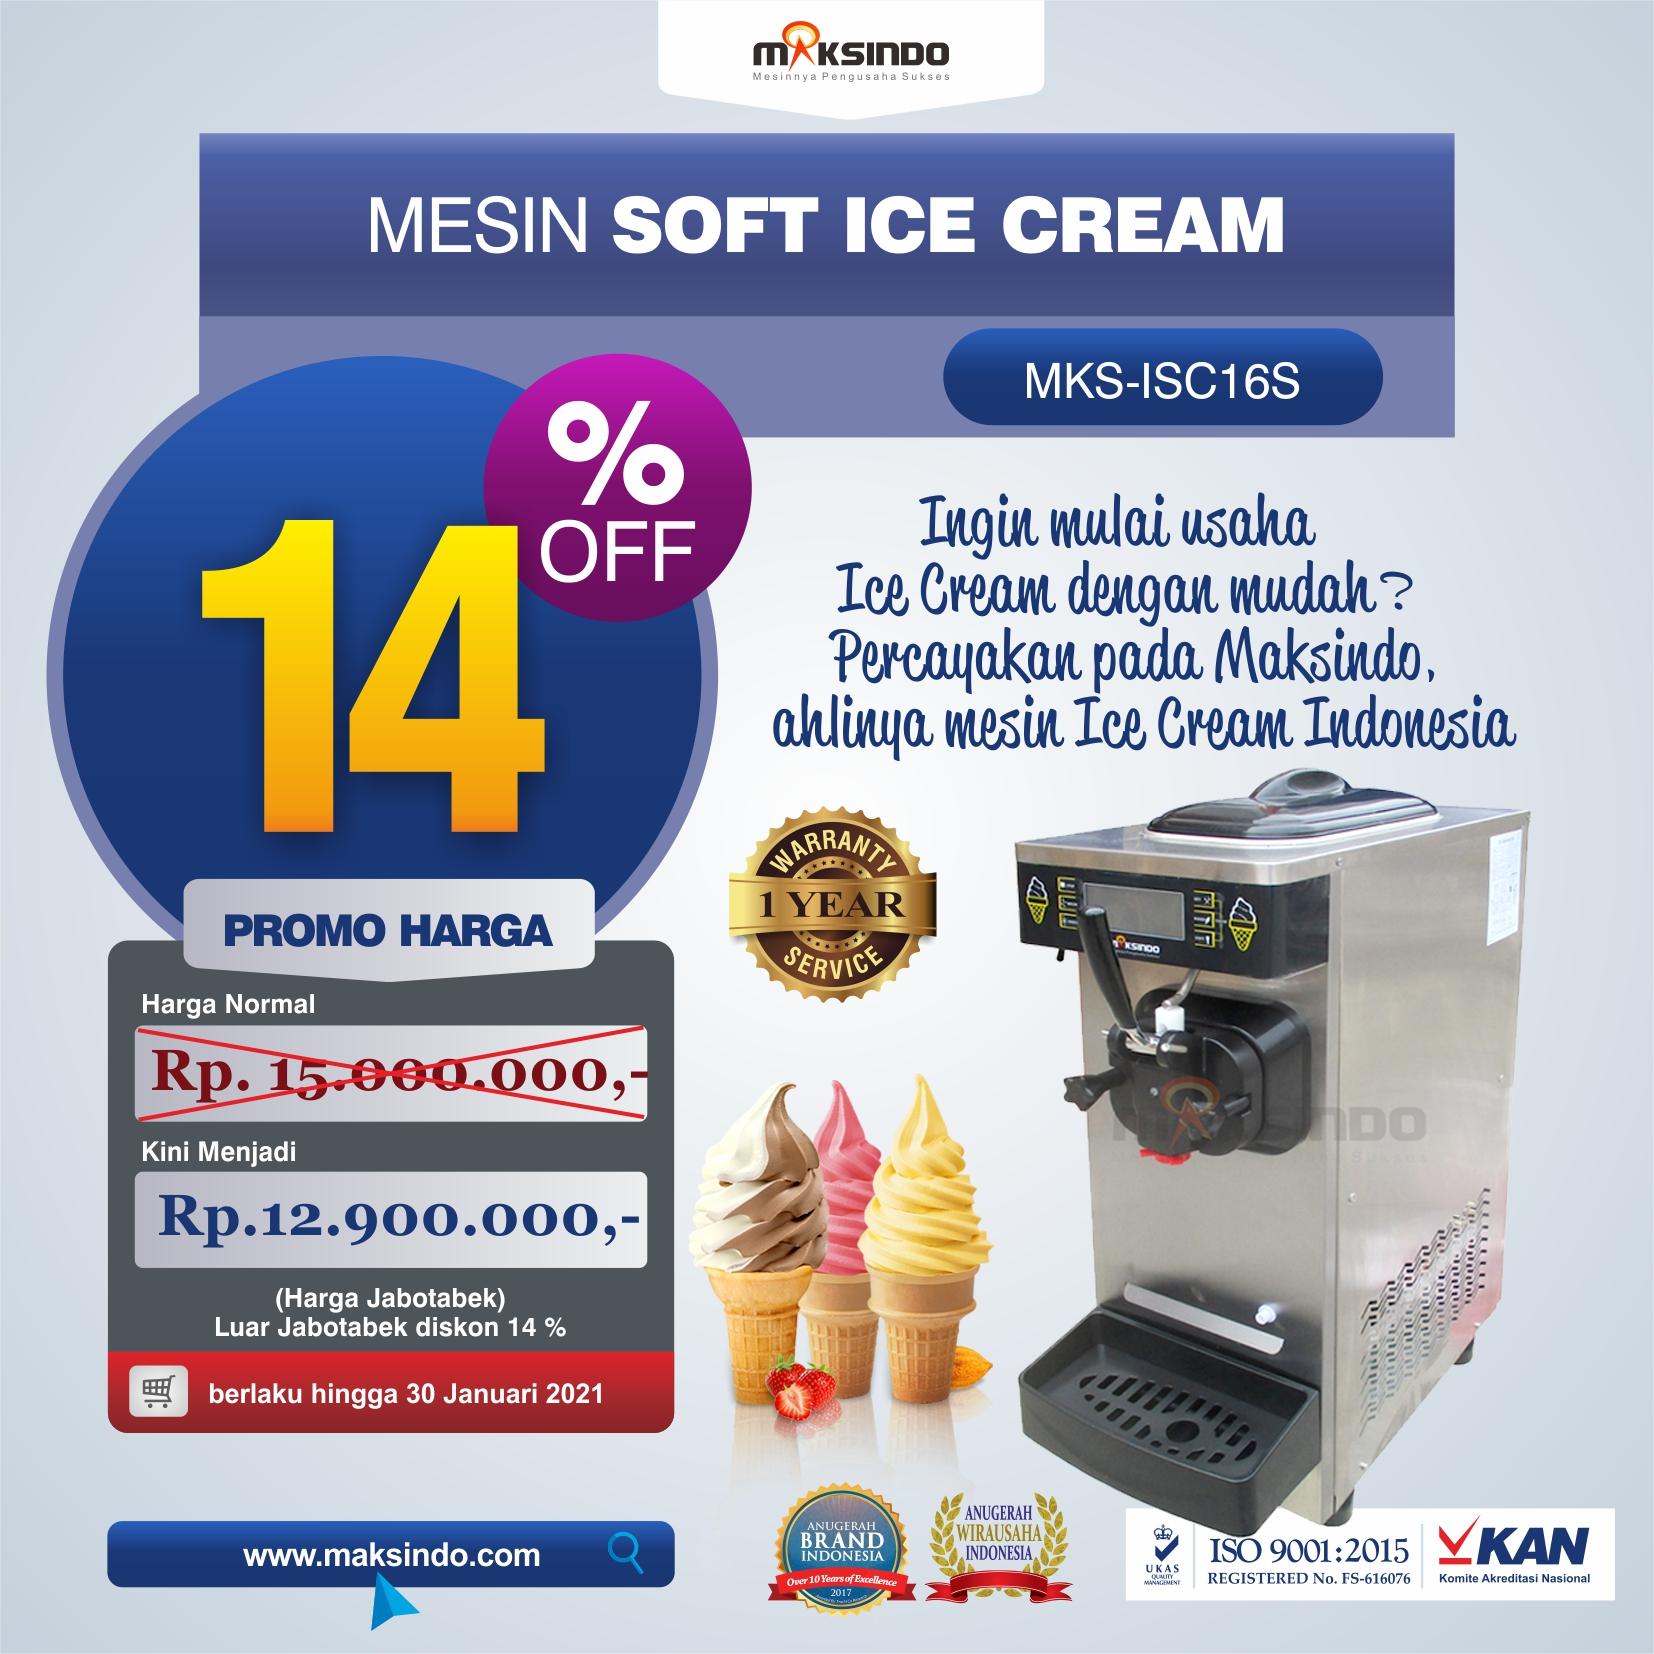 Jual Mesin Soft Ice Cream ISC-16S di Solo